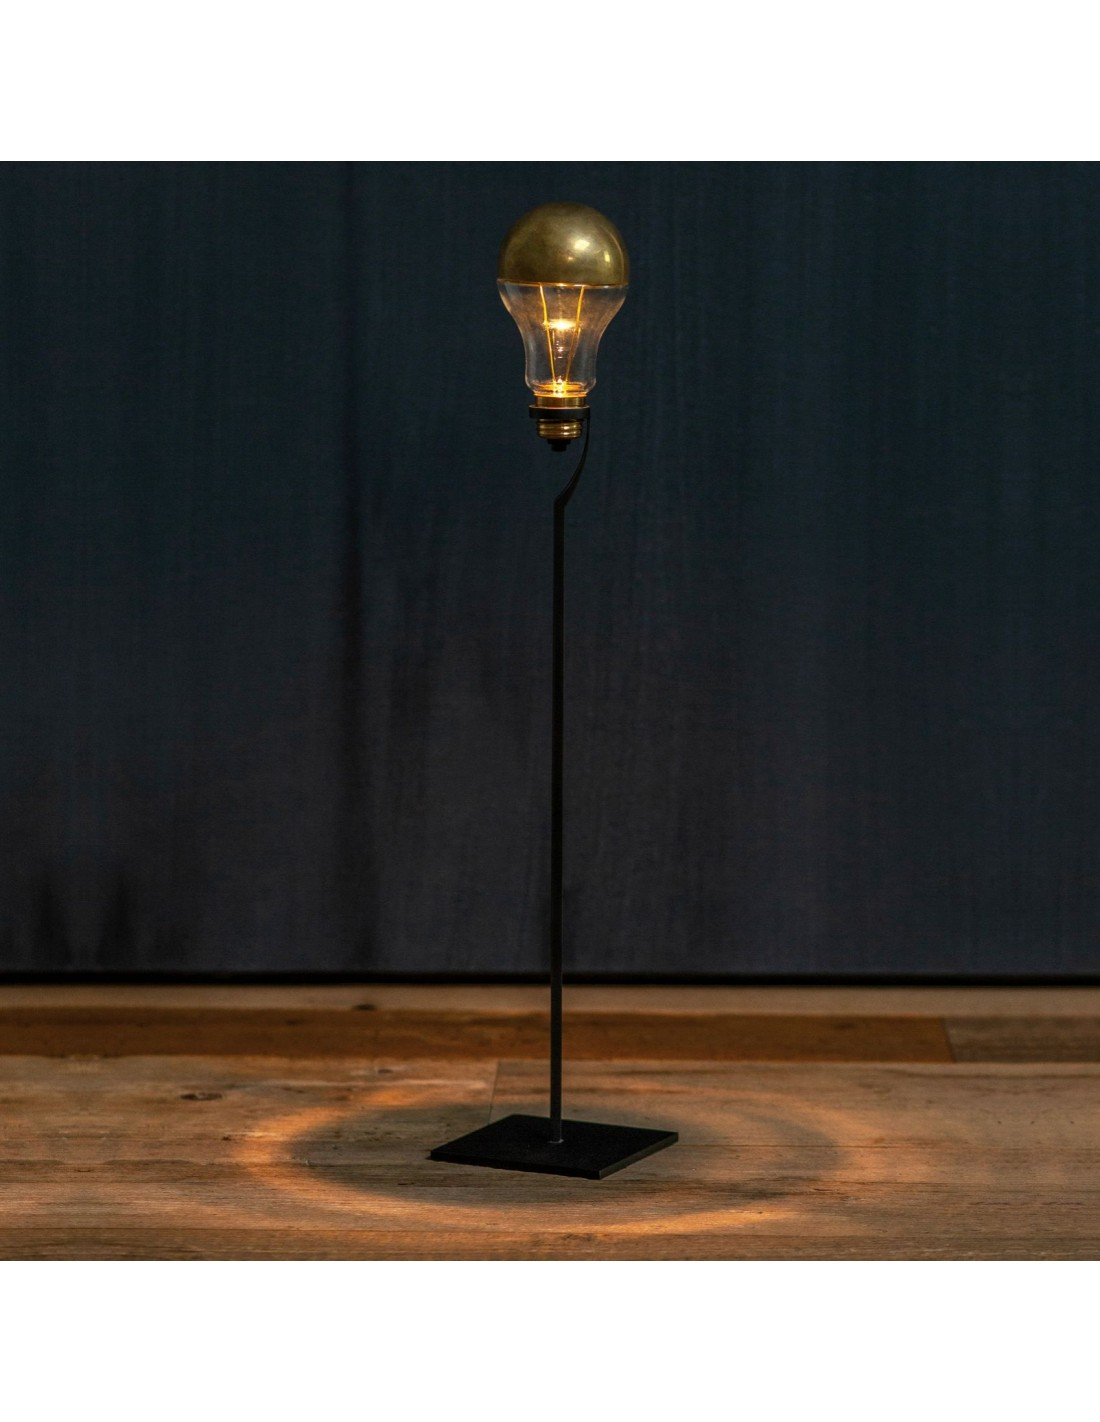 Lampe à poser Trenta Catellani and Smith Valente Design allumée